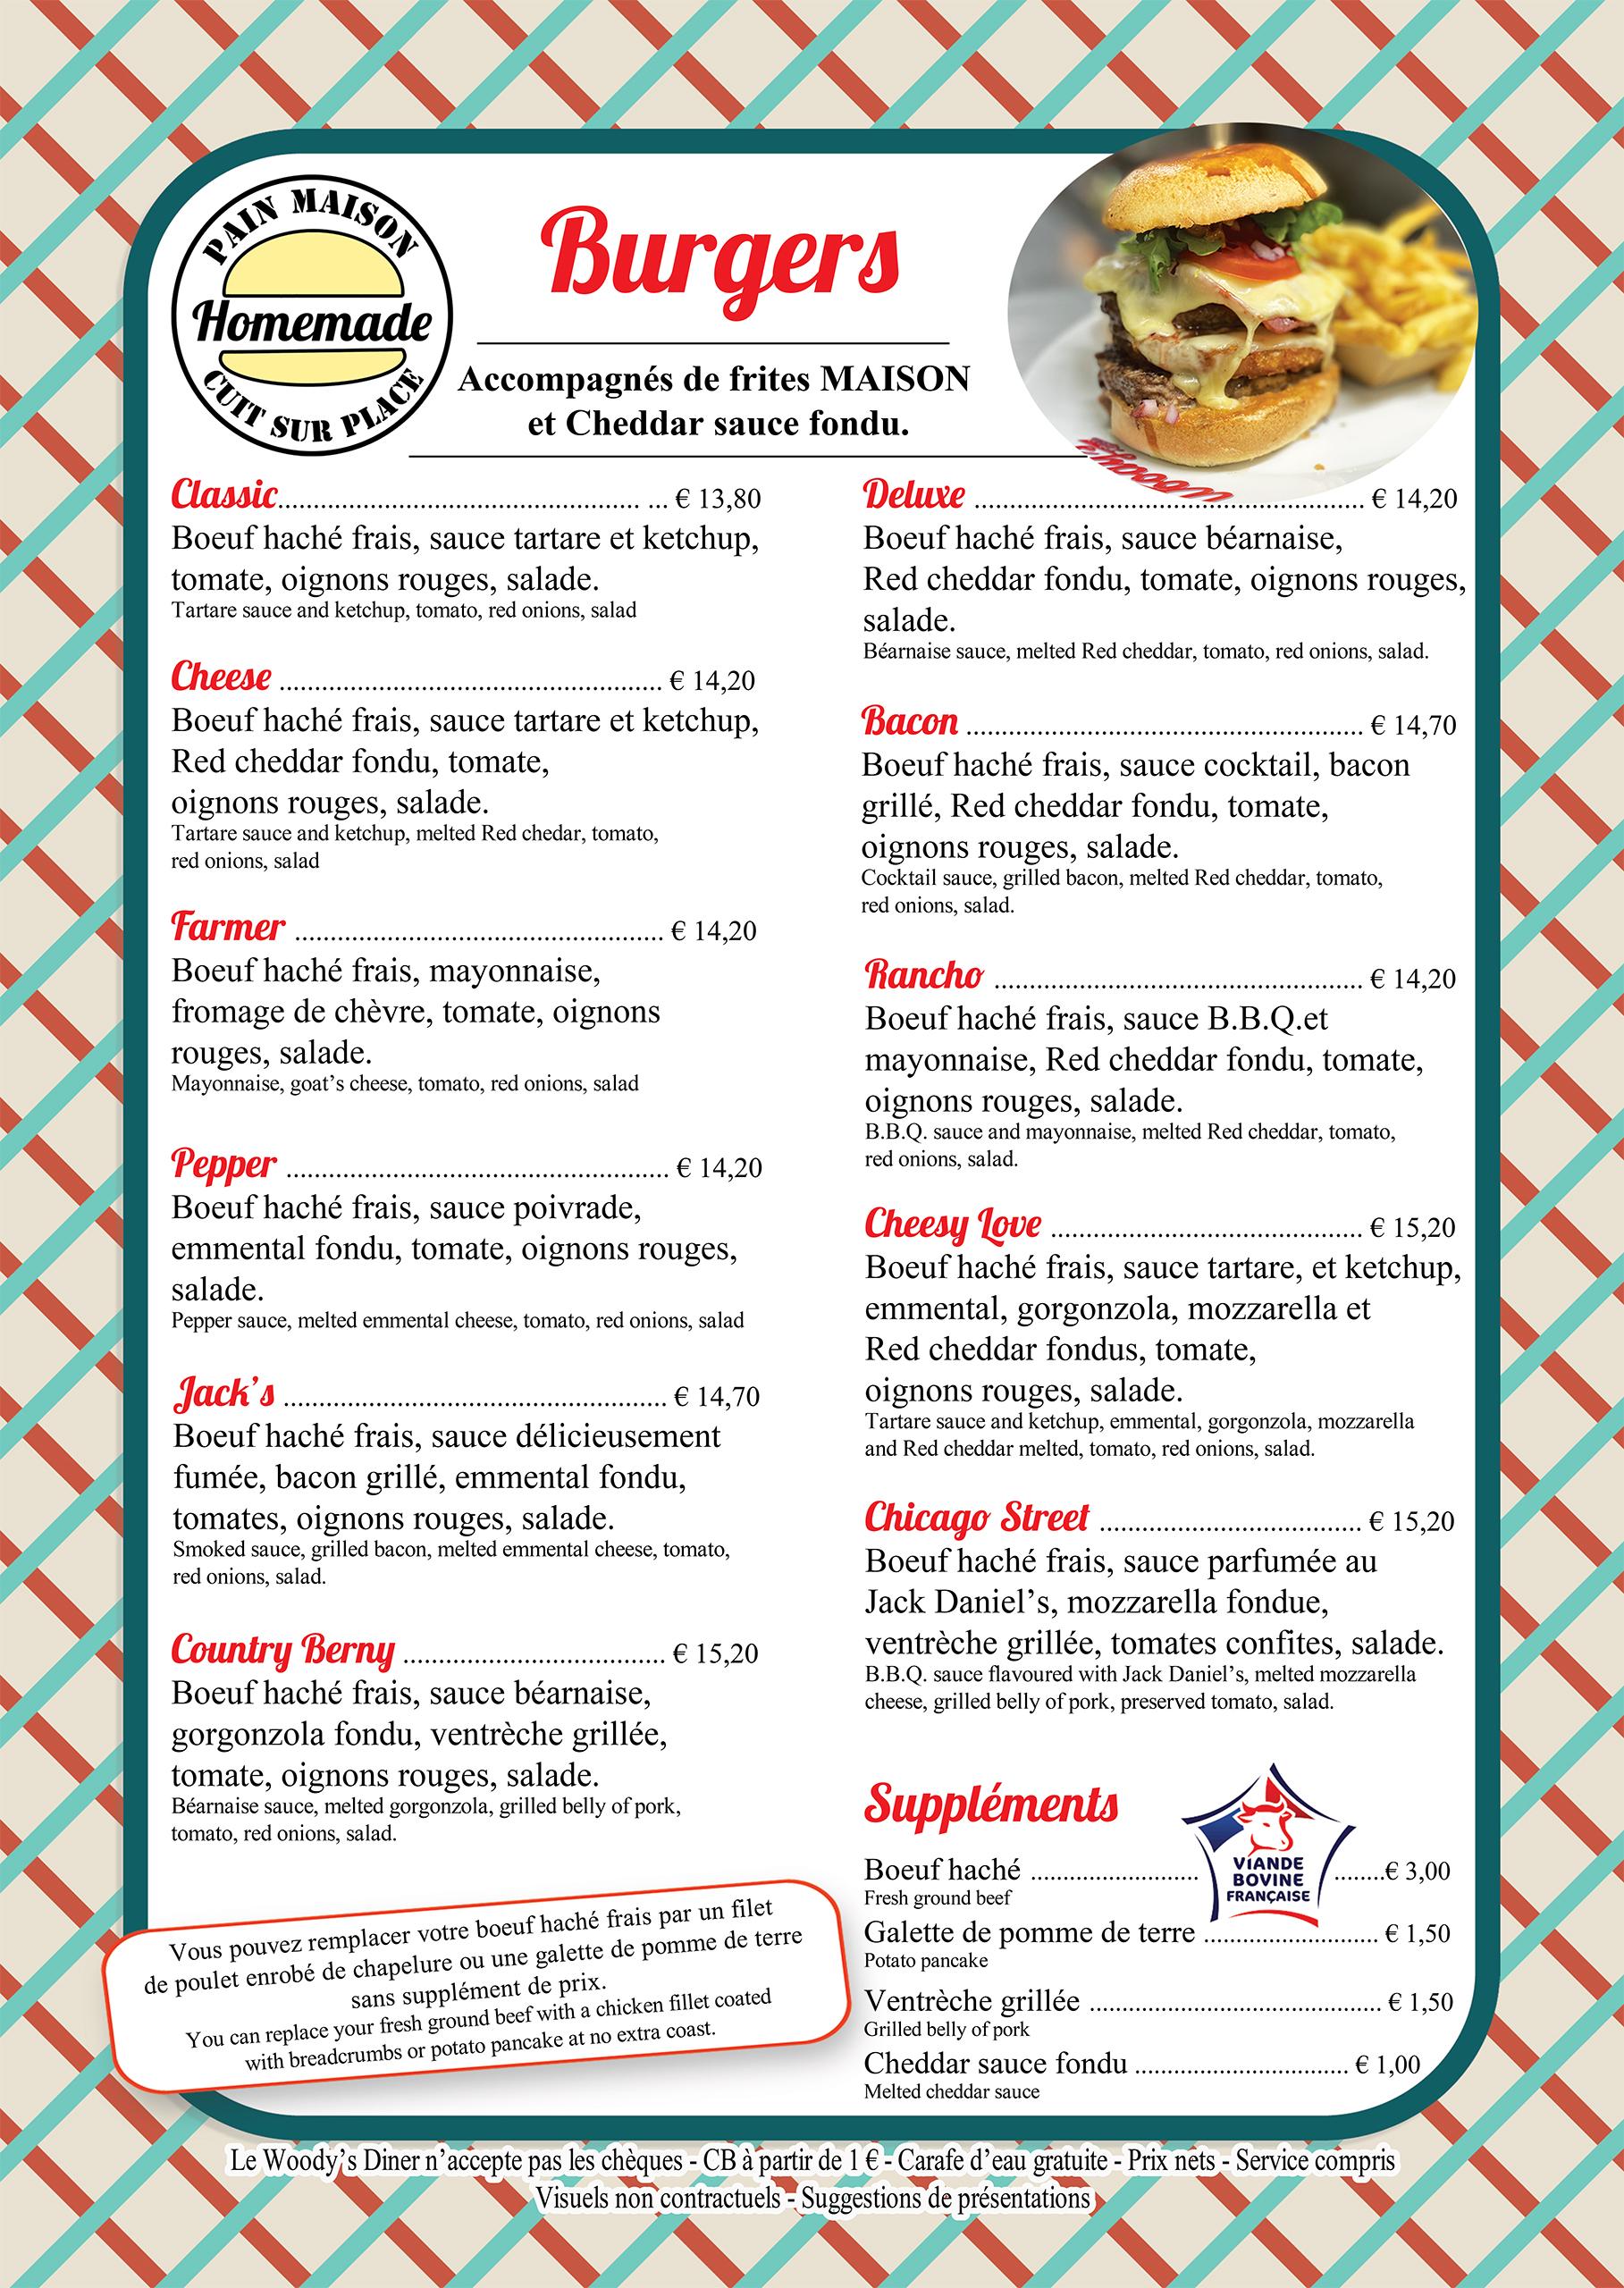 Burgers A4 07-11-20